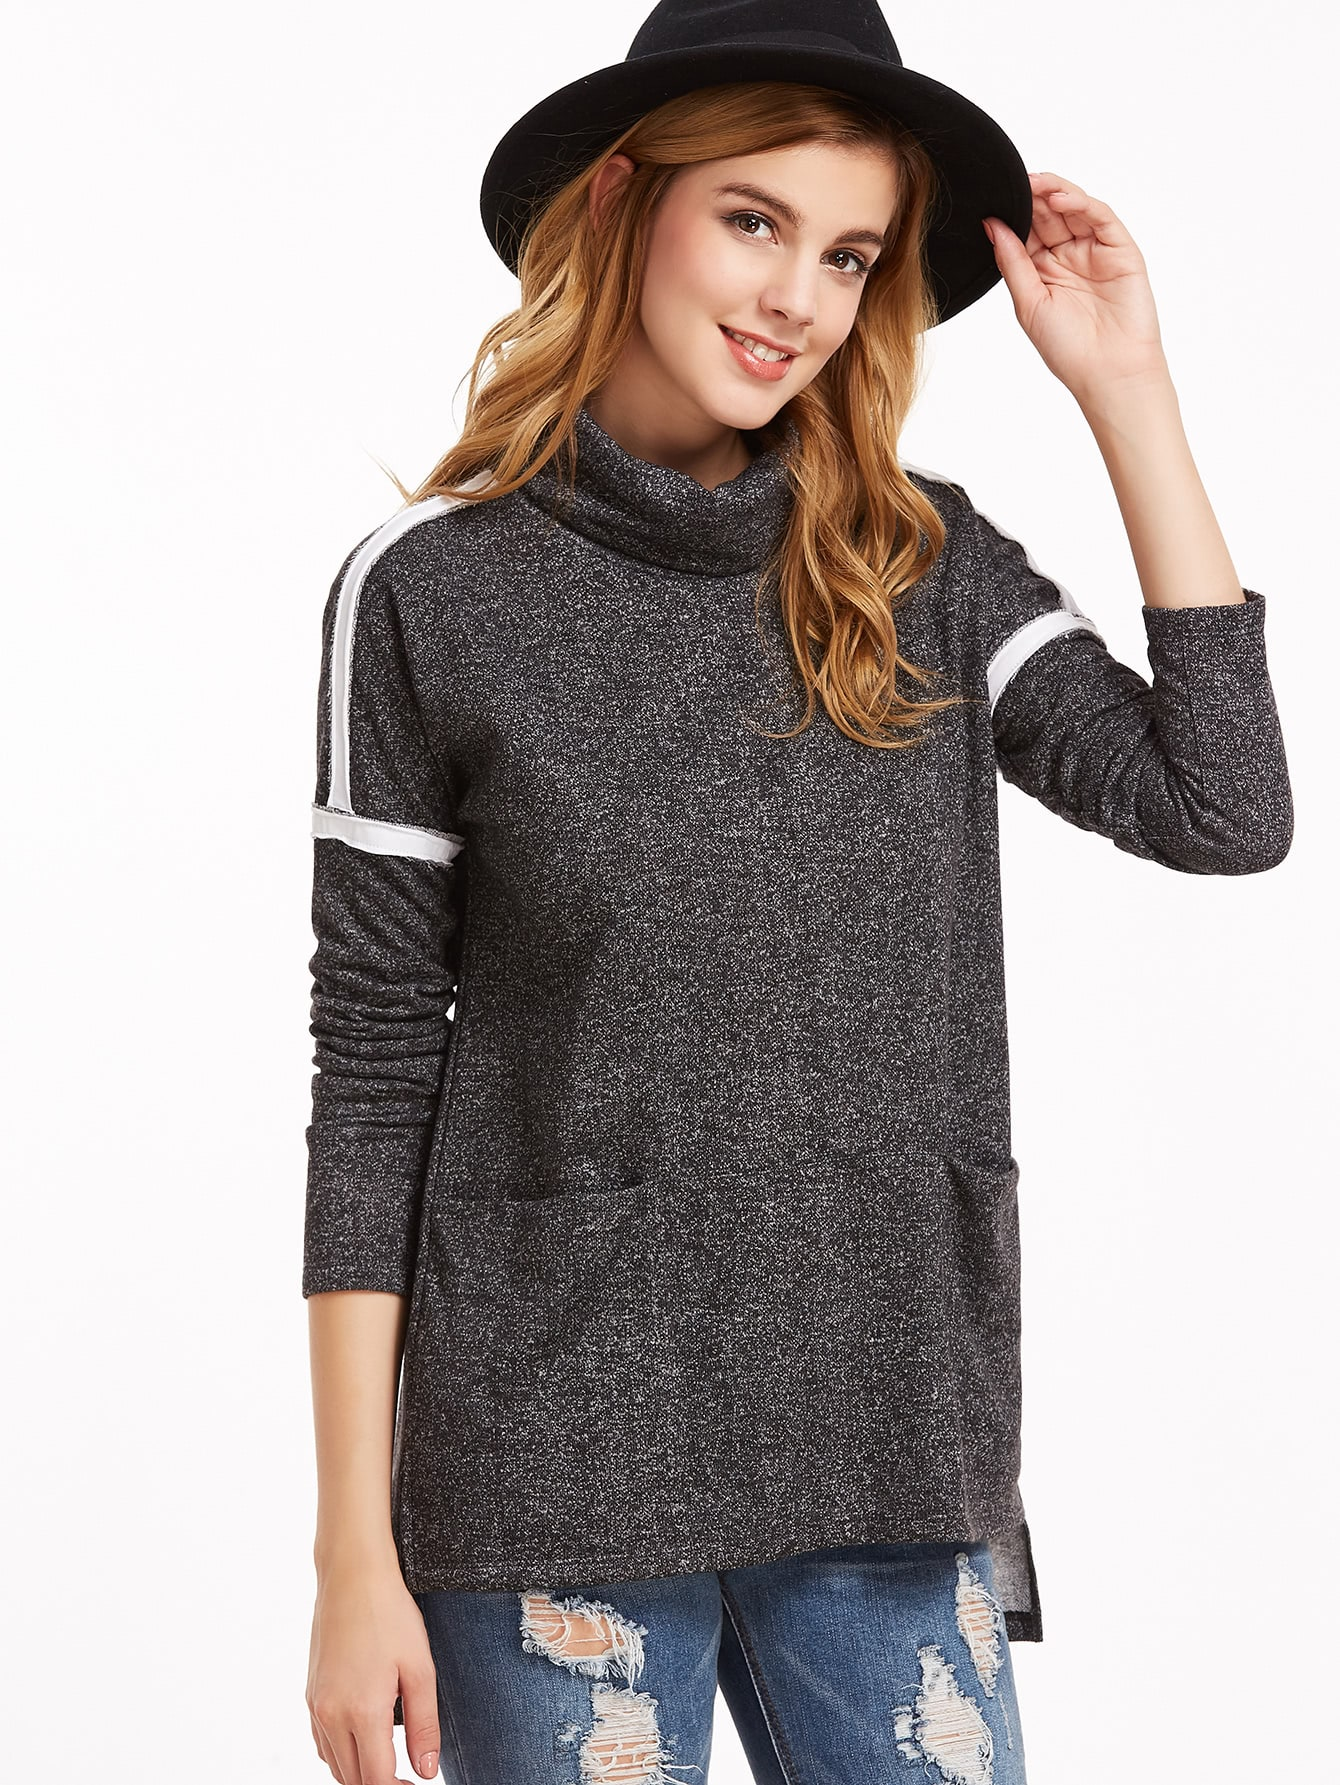 Black Marled Knit Turtleneck Striped Sleeve High Low T-shirtBlack Marled Knit Turtleneck Striped Sleeve High Low T-shirt<br><br>color: Black<br>size: L,M,S,XS